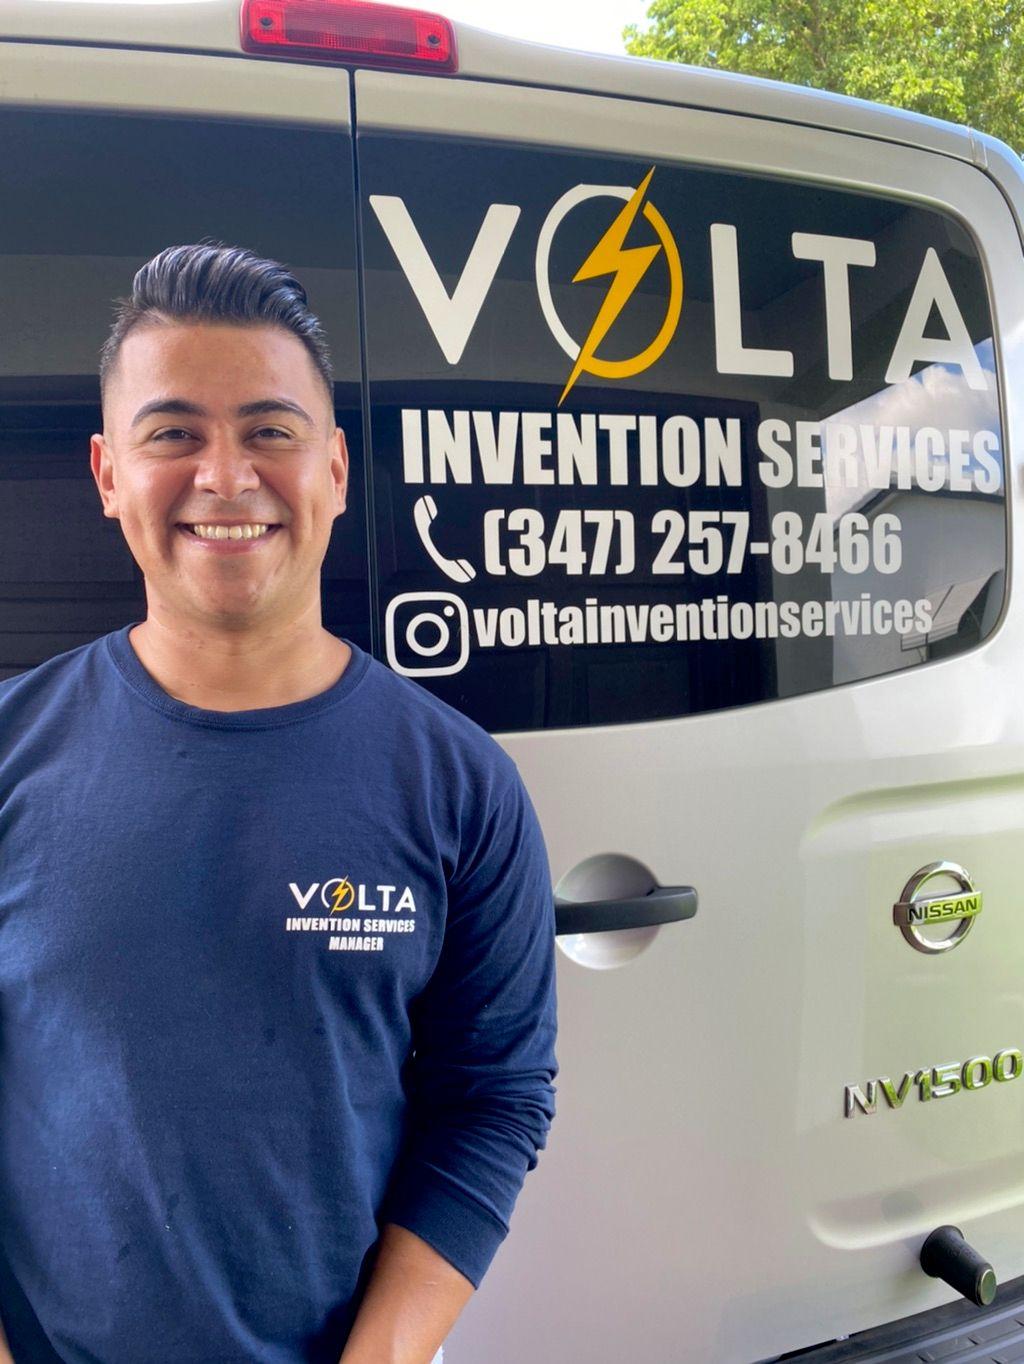 Volta Invention Services